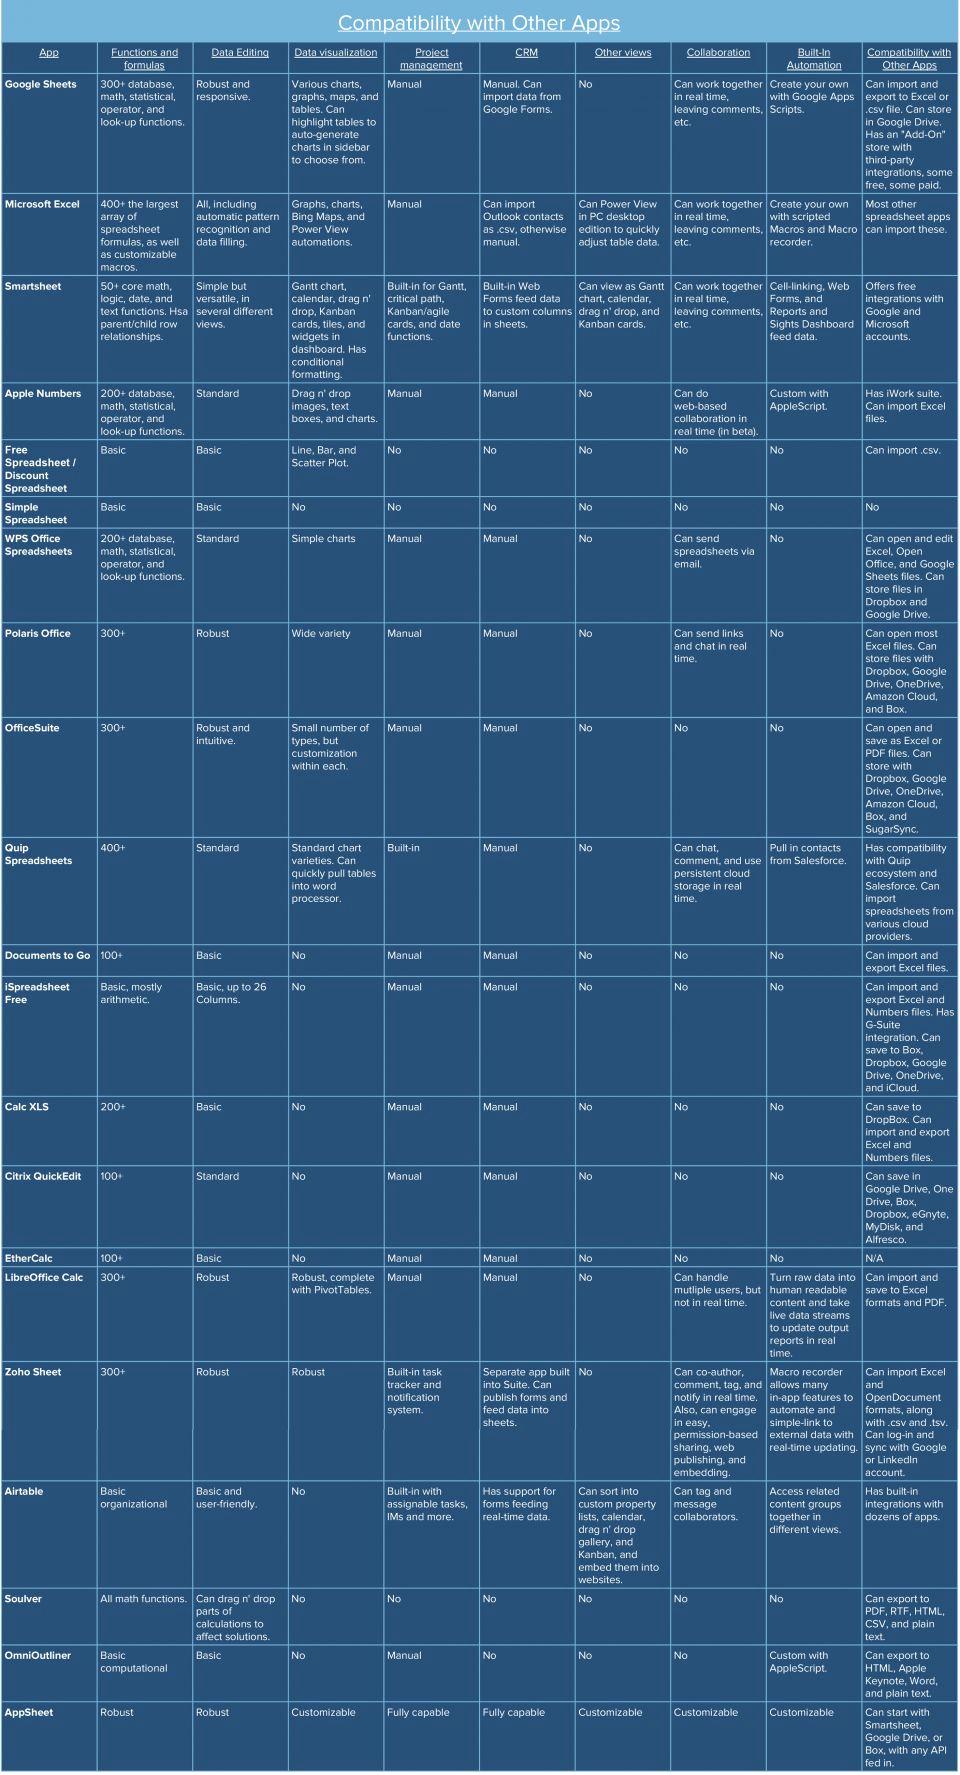 Free Spreadsheet App For Ipad Regarding Best Free Spreadsheet App And Best Free Spreadsheet App For Ipad